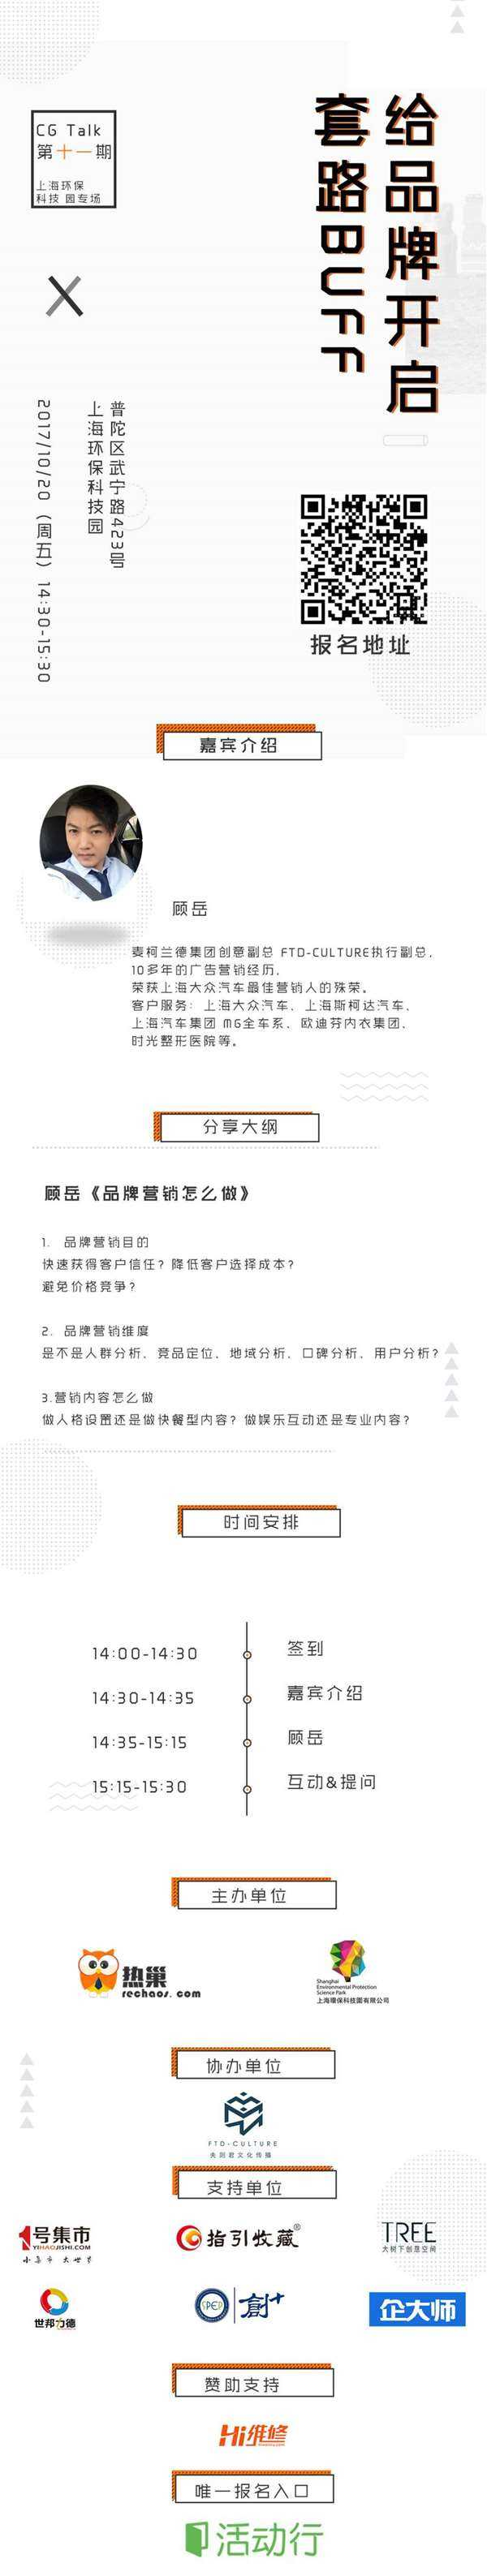 sbf胜博发娱乐城banner详细 【含报名二维码】-改.jpg